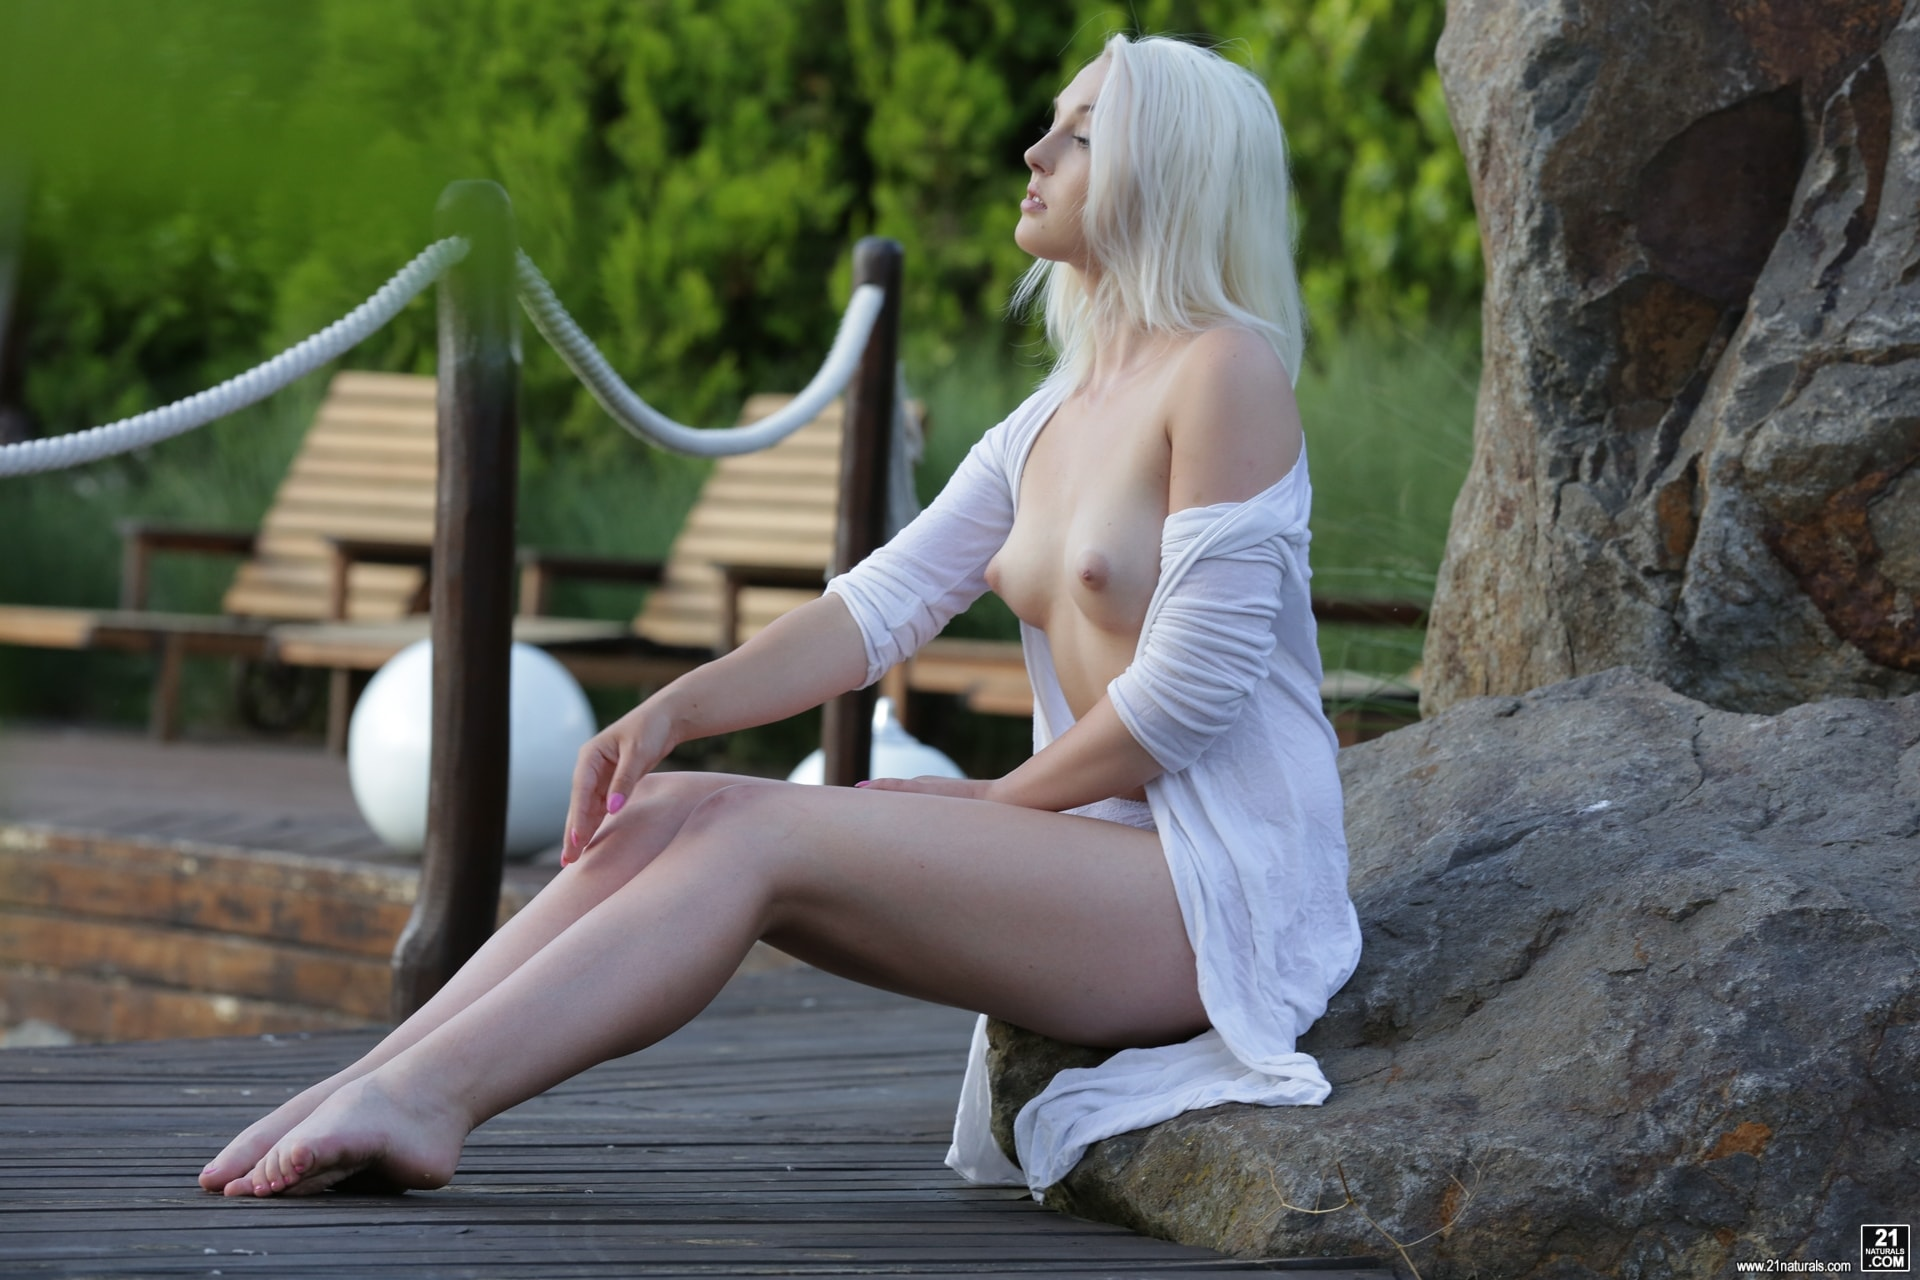 21Sextury 'Loving Lovisa' starring Lovisa Fate (Photo 16)